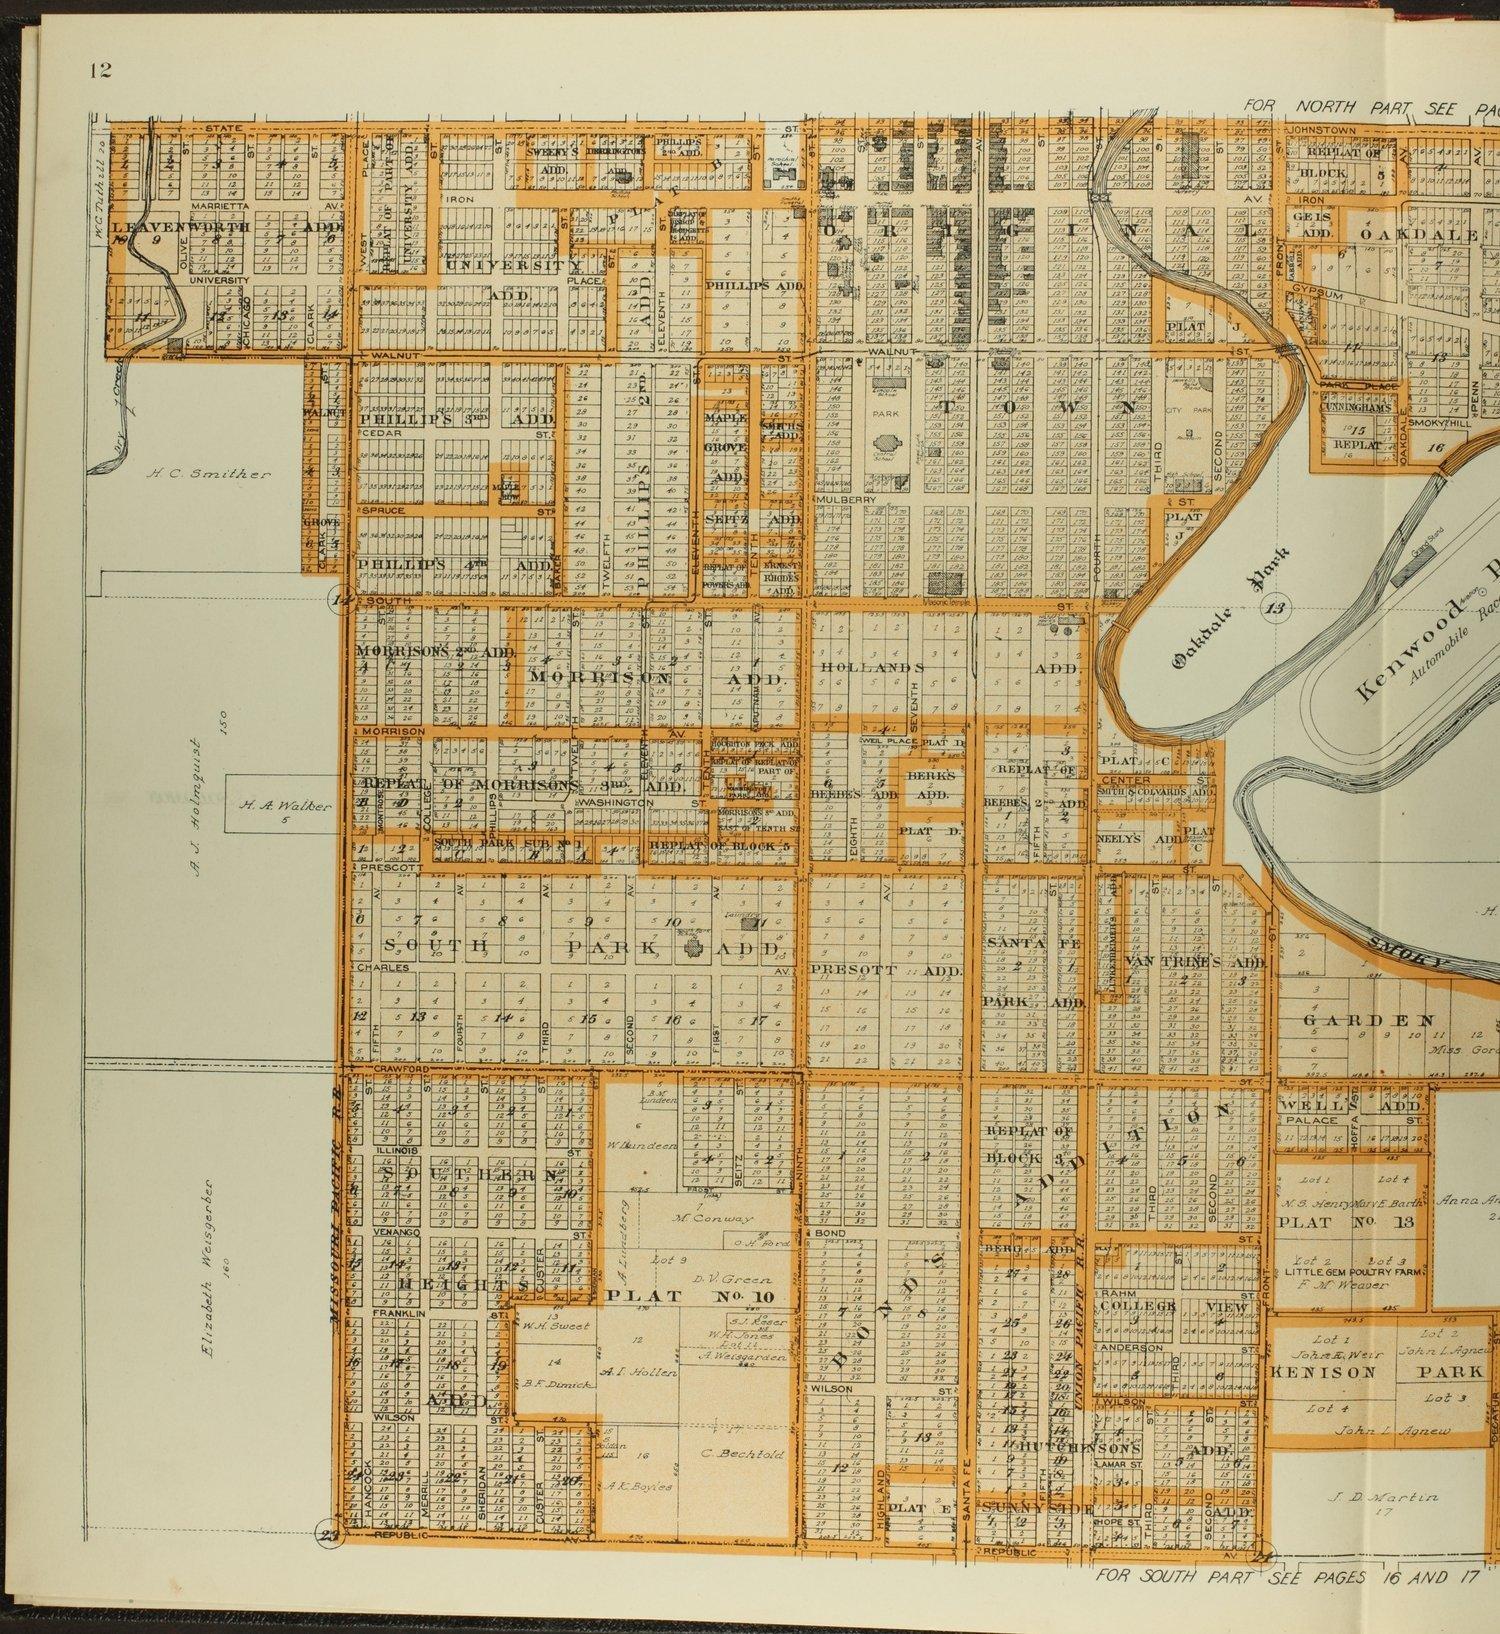 Standard atlas of Saline County, Kansas - 12